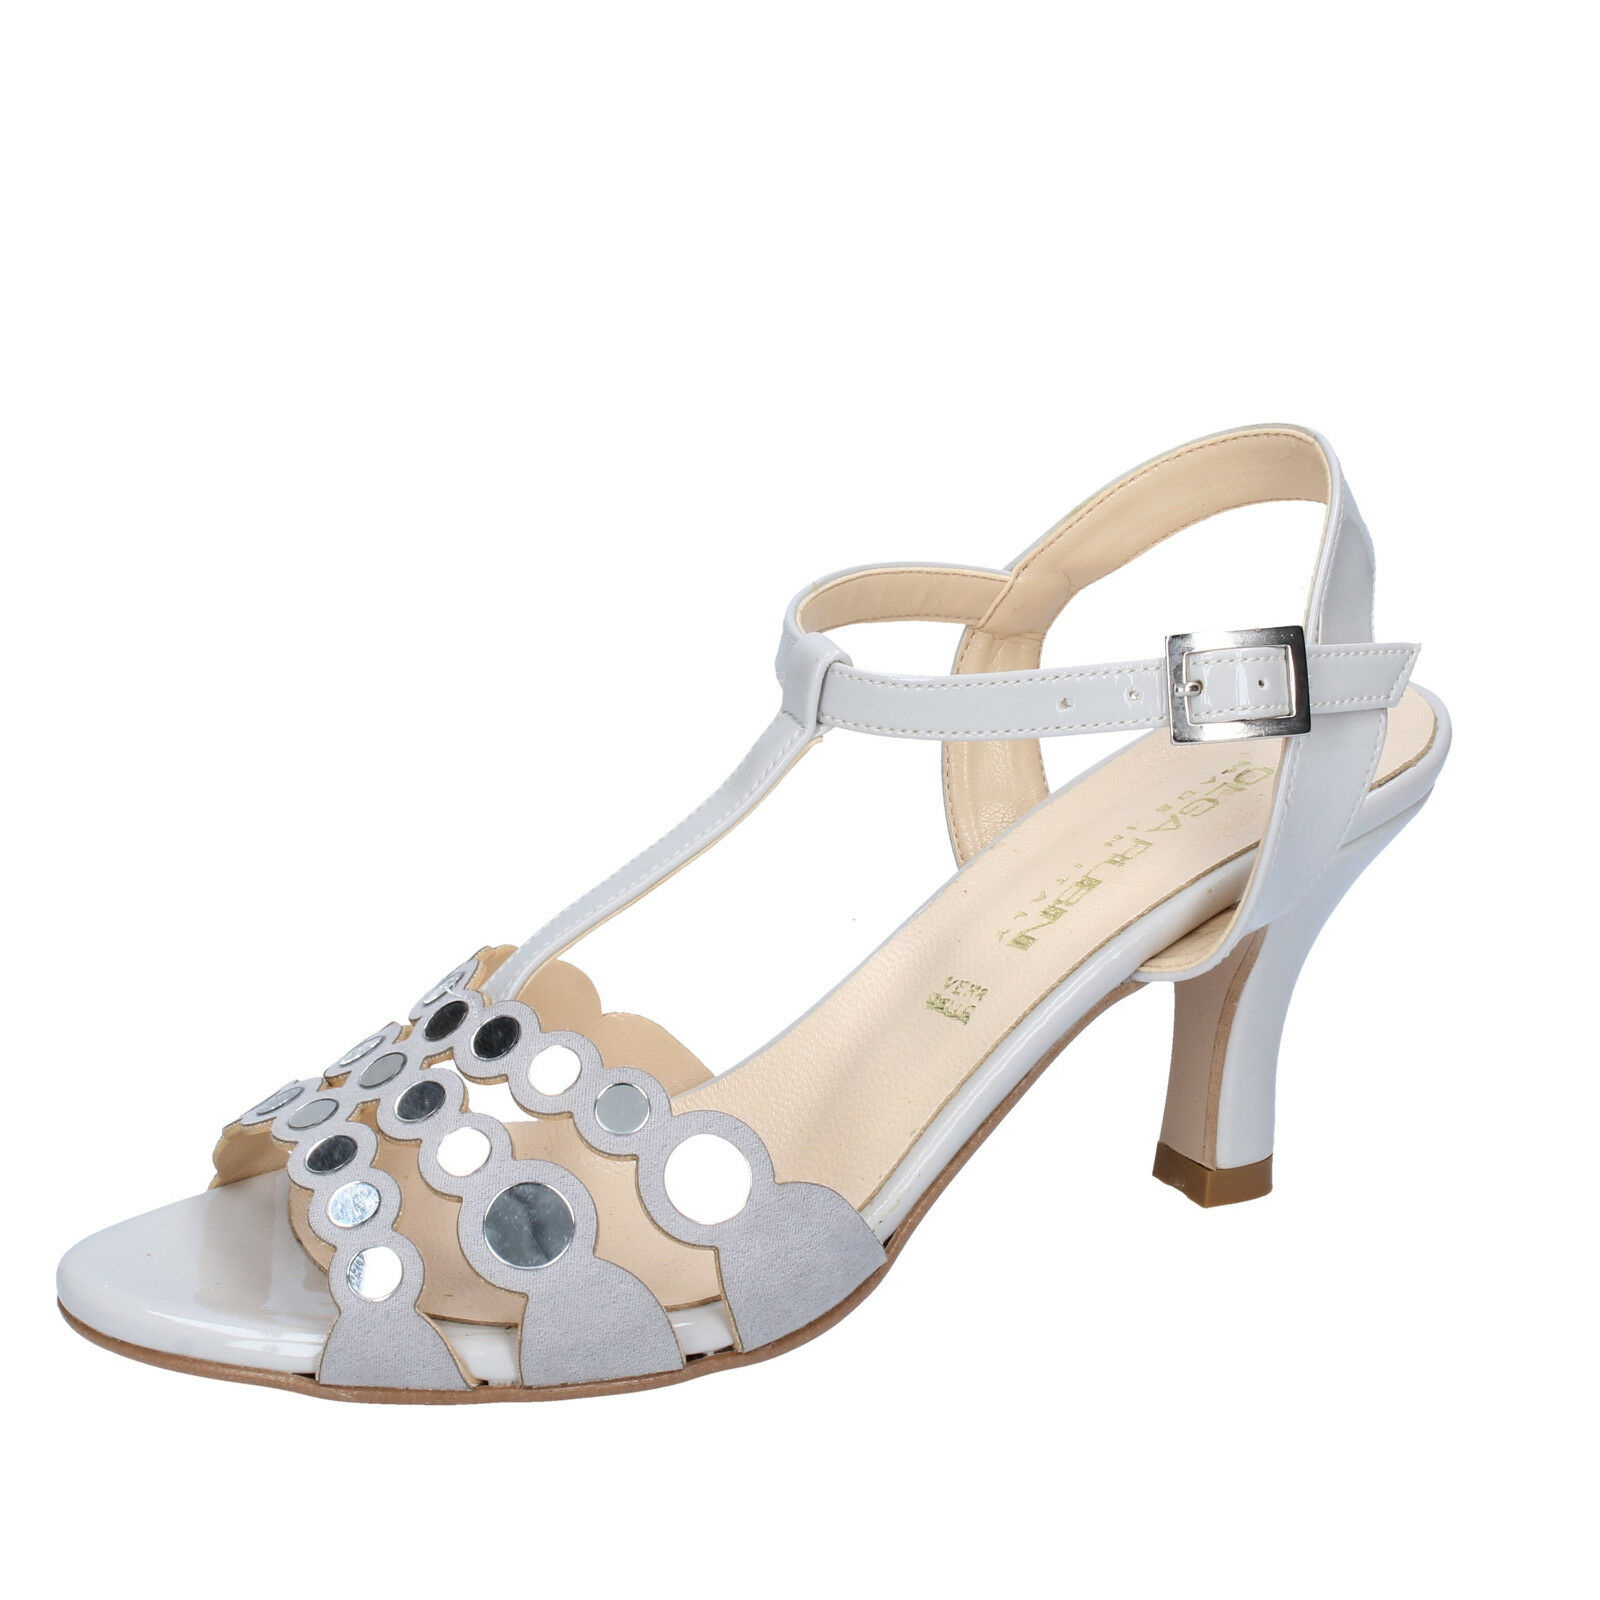 Damen schuhe OLGA RUBINI 38 EU sandalen grau wildleder lack BY354-E